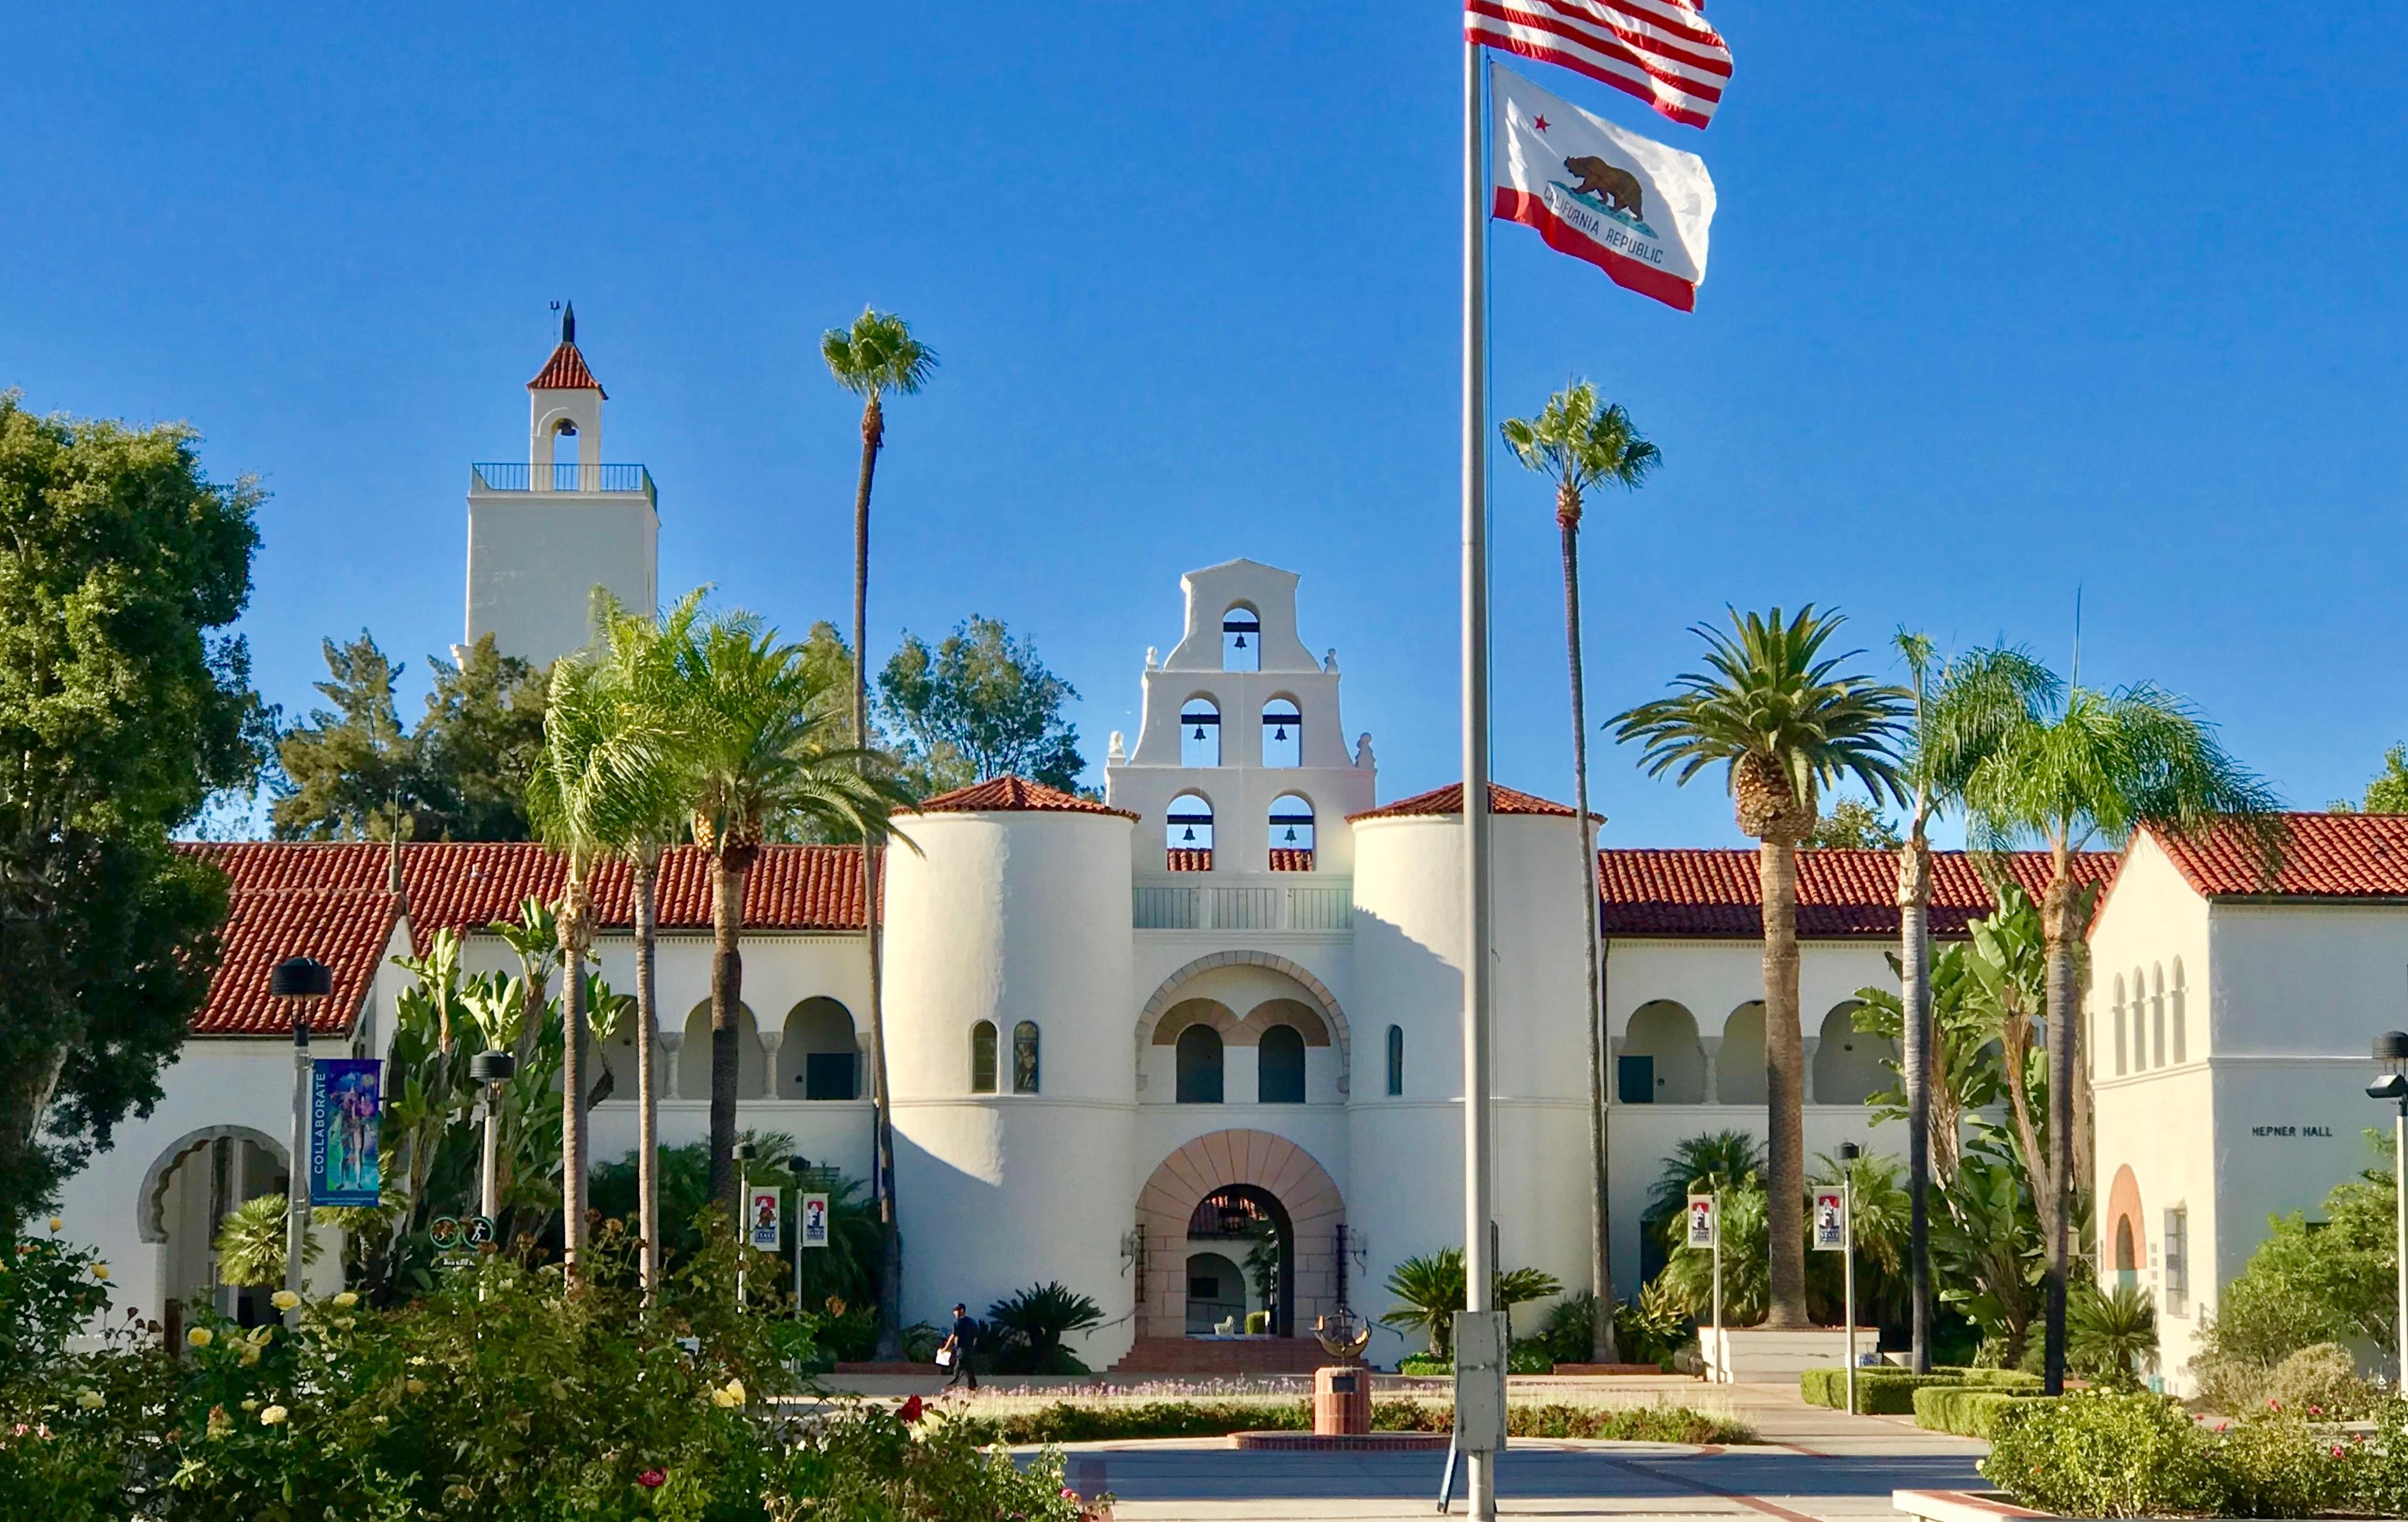 San Diego State University Has Shut Down Its Confucius Institute